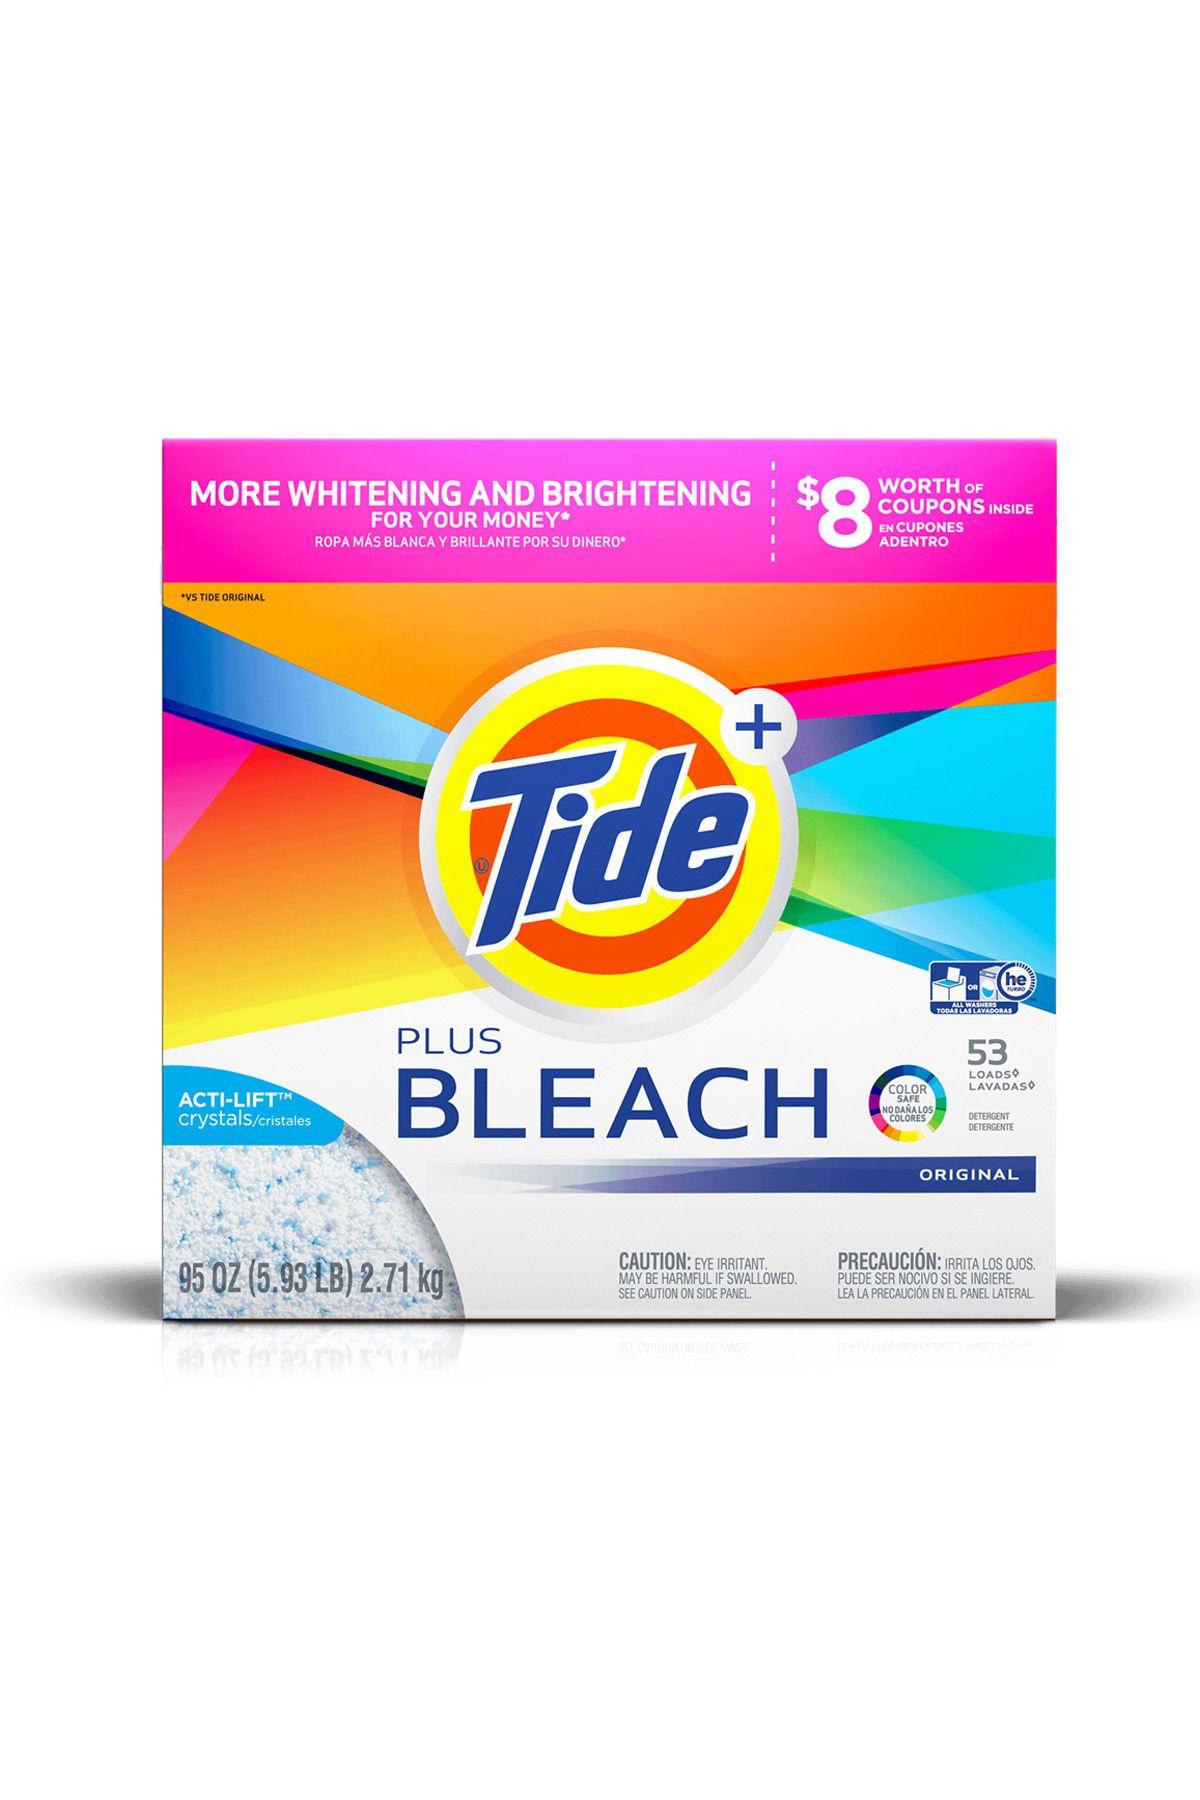 Hero Liquid Laundry Detergent Best Laundry Detergent Laundry Detergent Powder Laundry Detergent